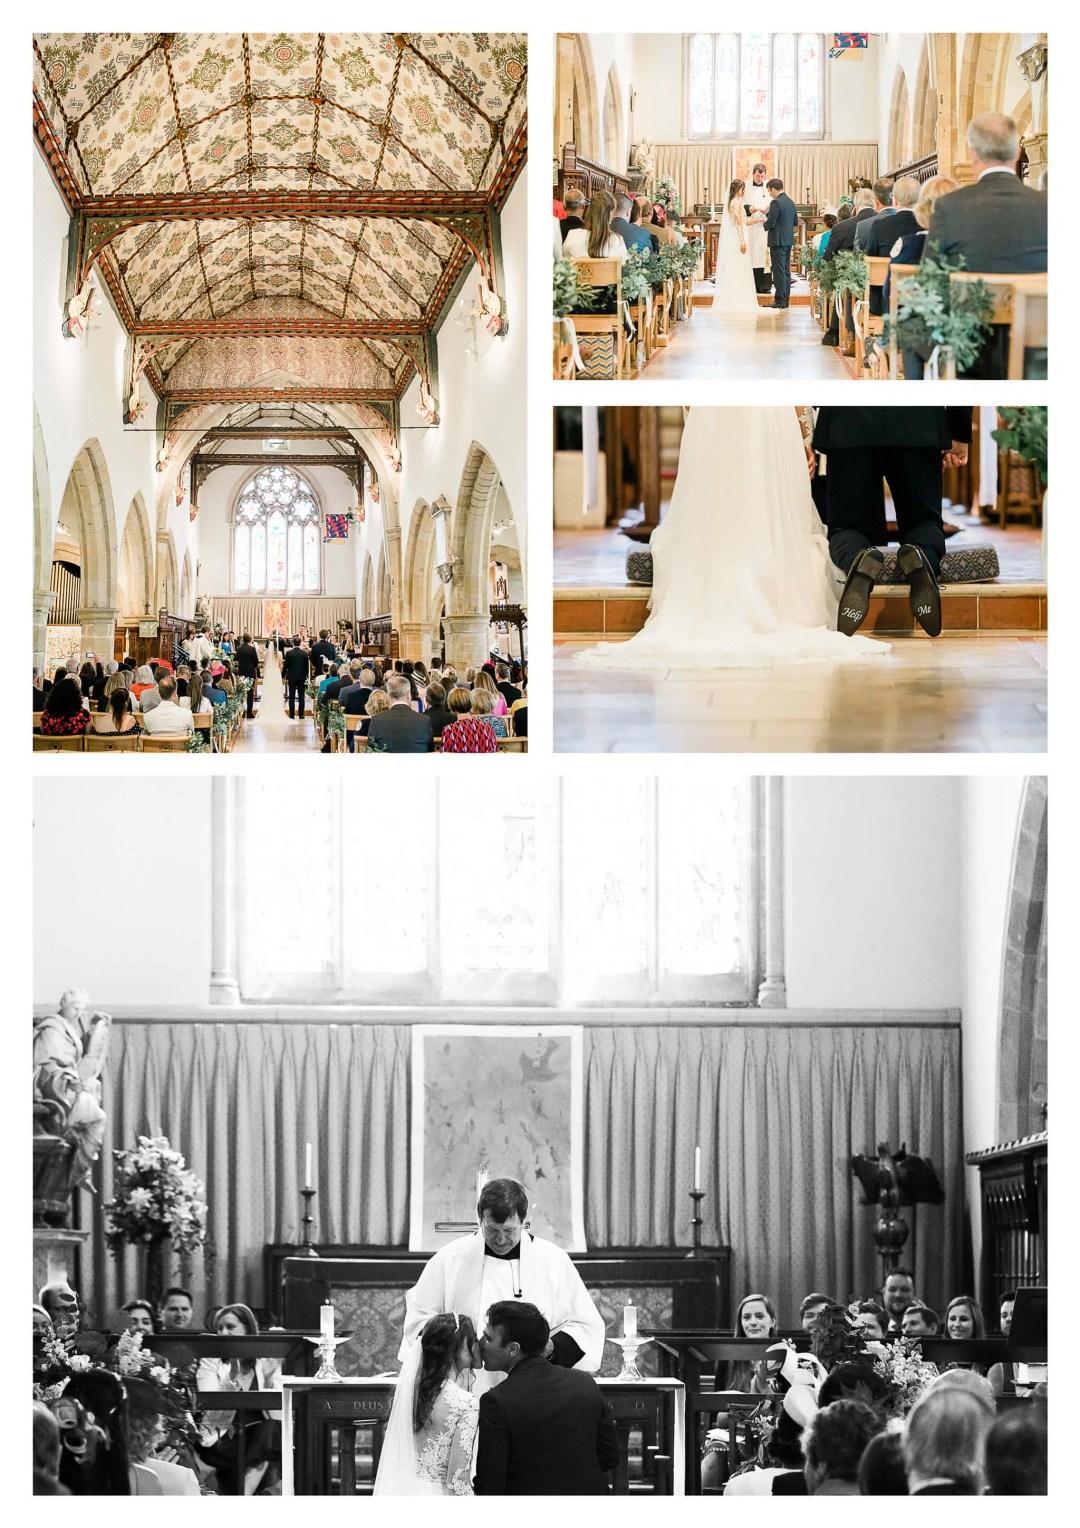 Holy Trinity Church wedding ceremony | Cuckfield Photographer